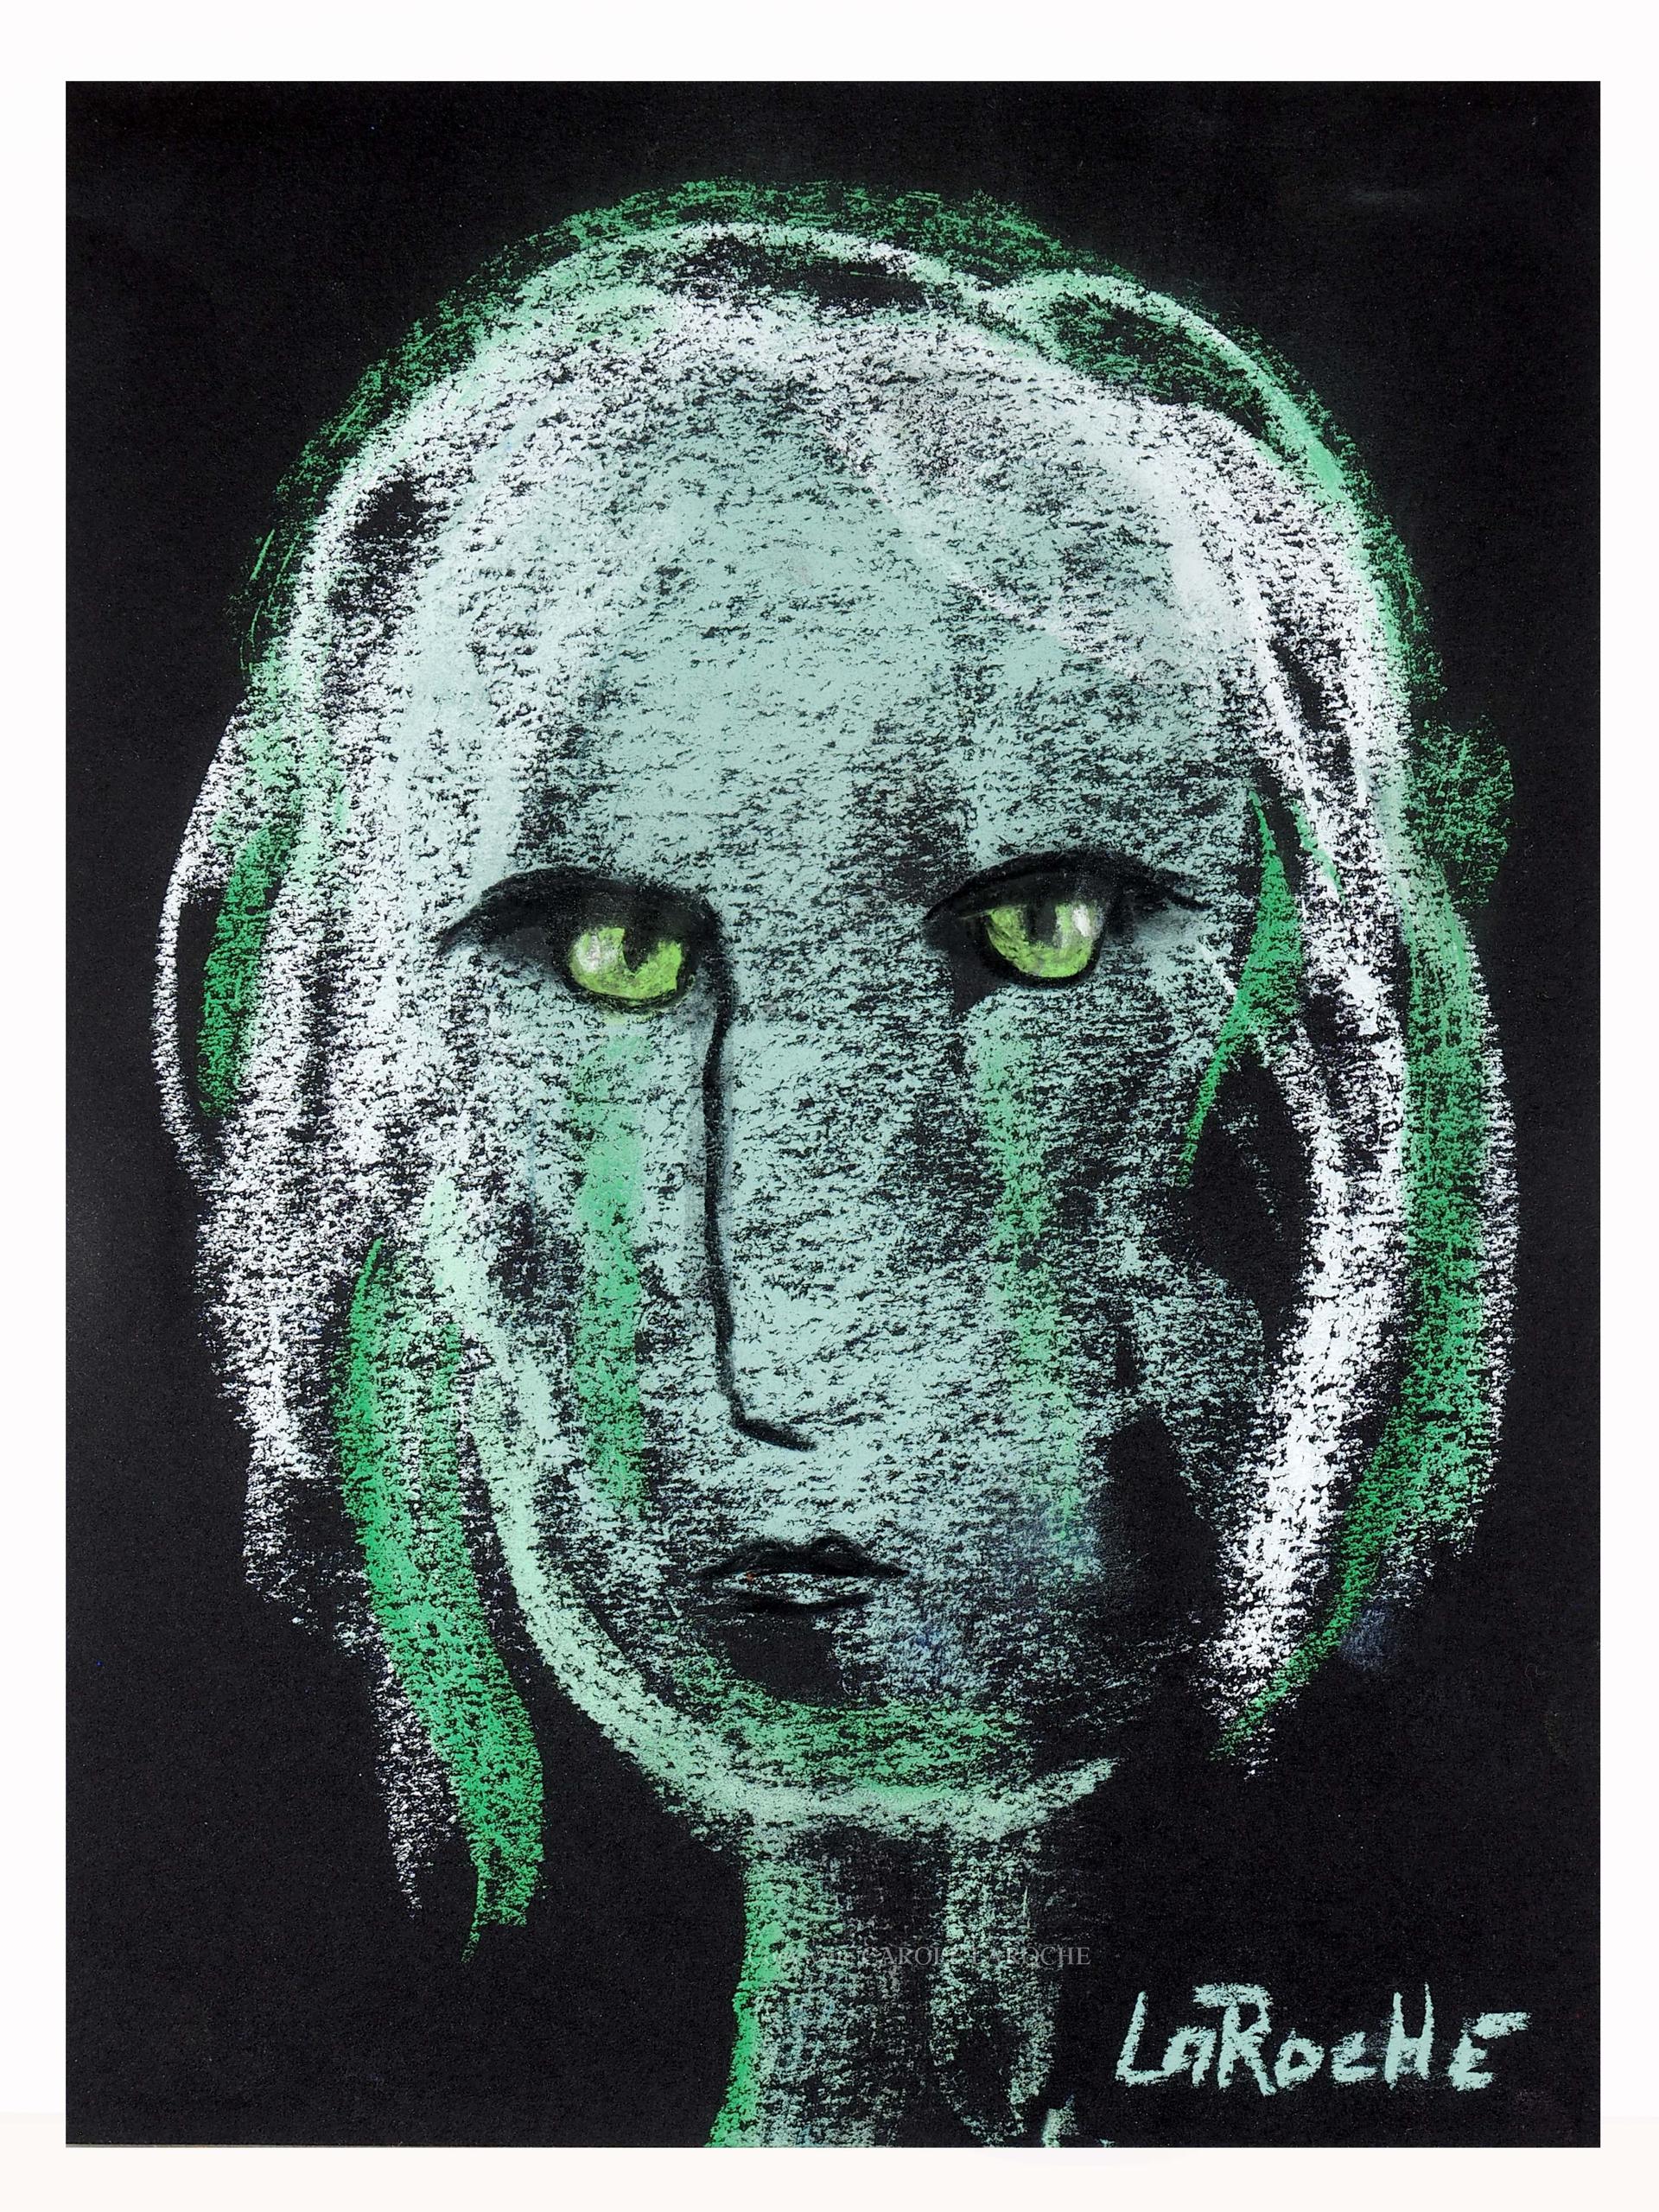 GREEN EYED MESSENGER by Carole LaRoche